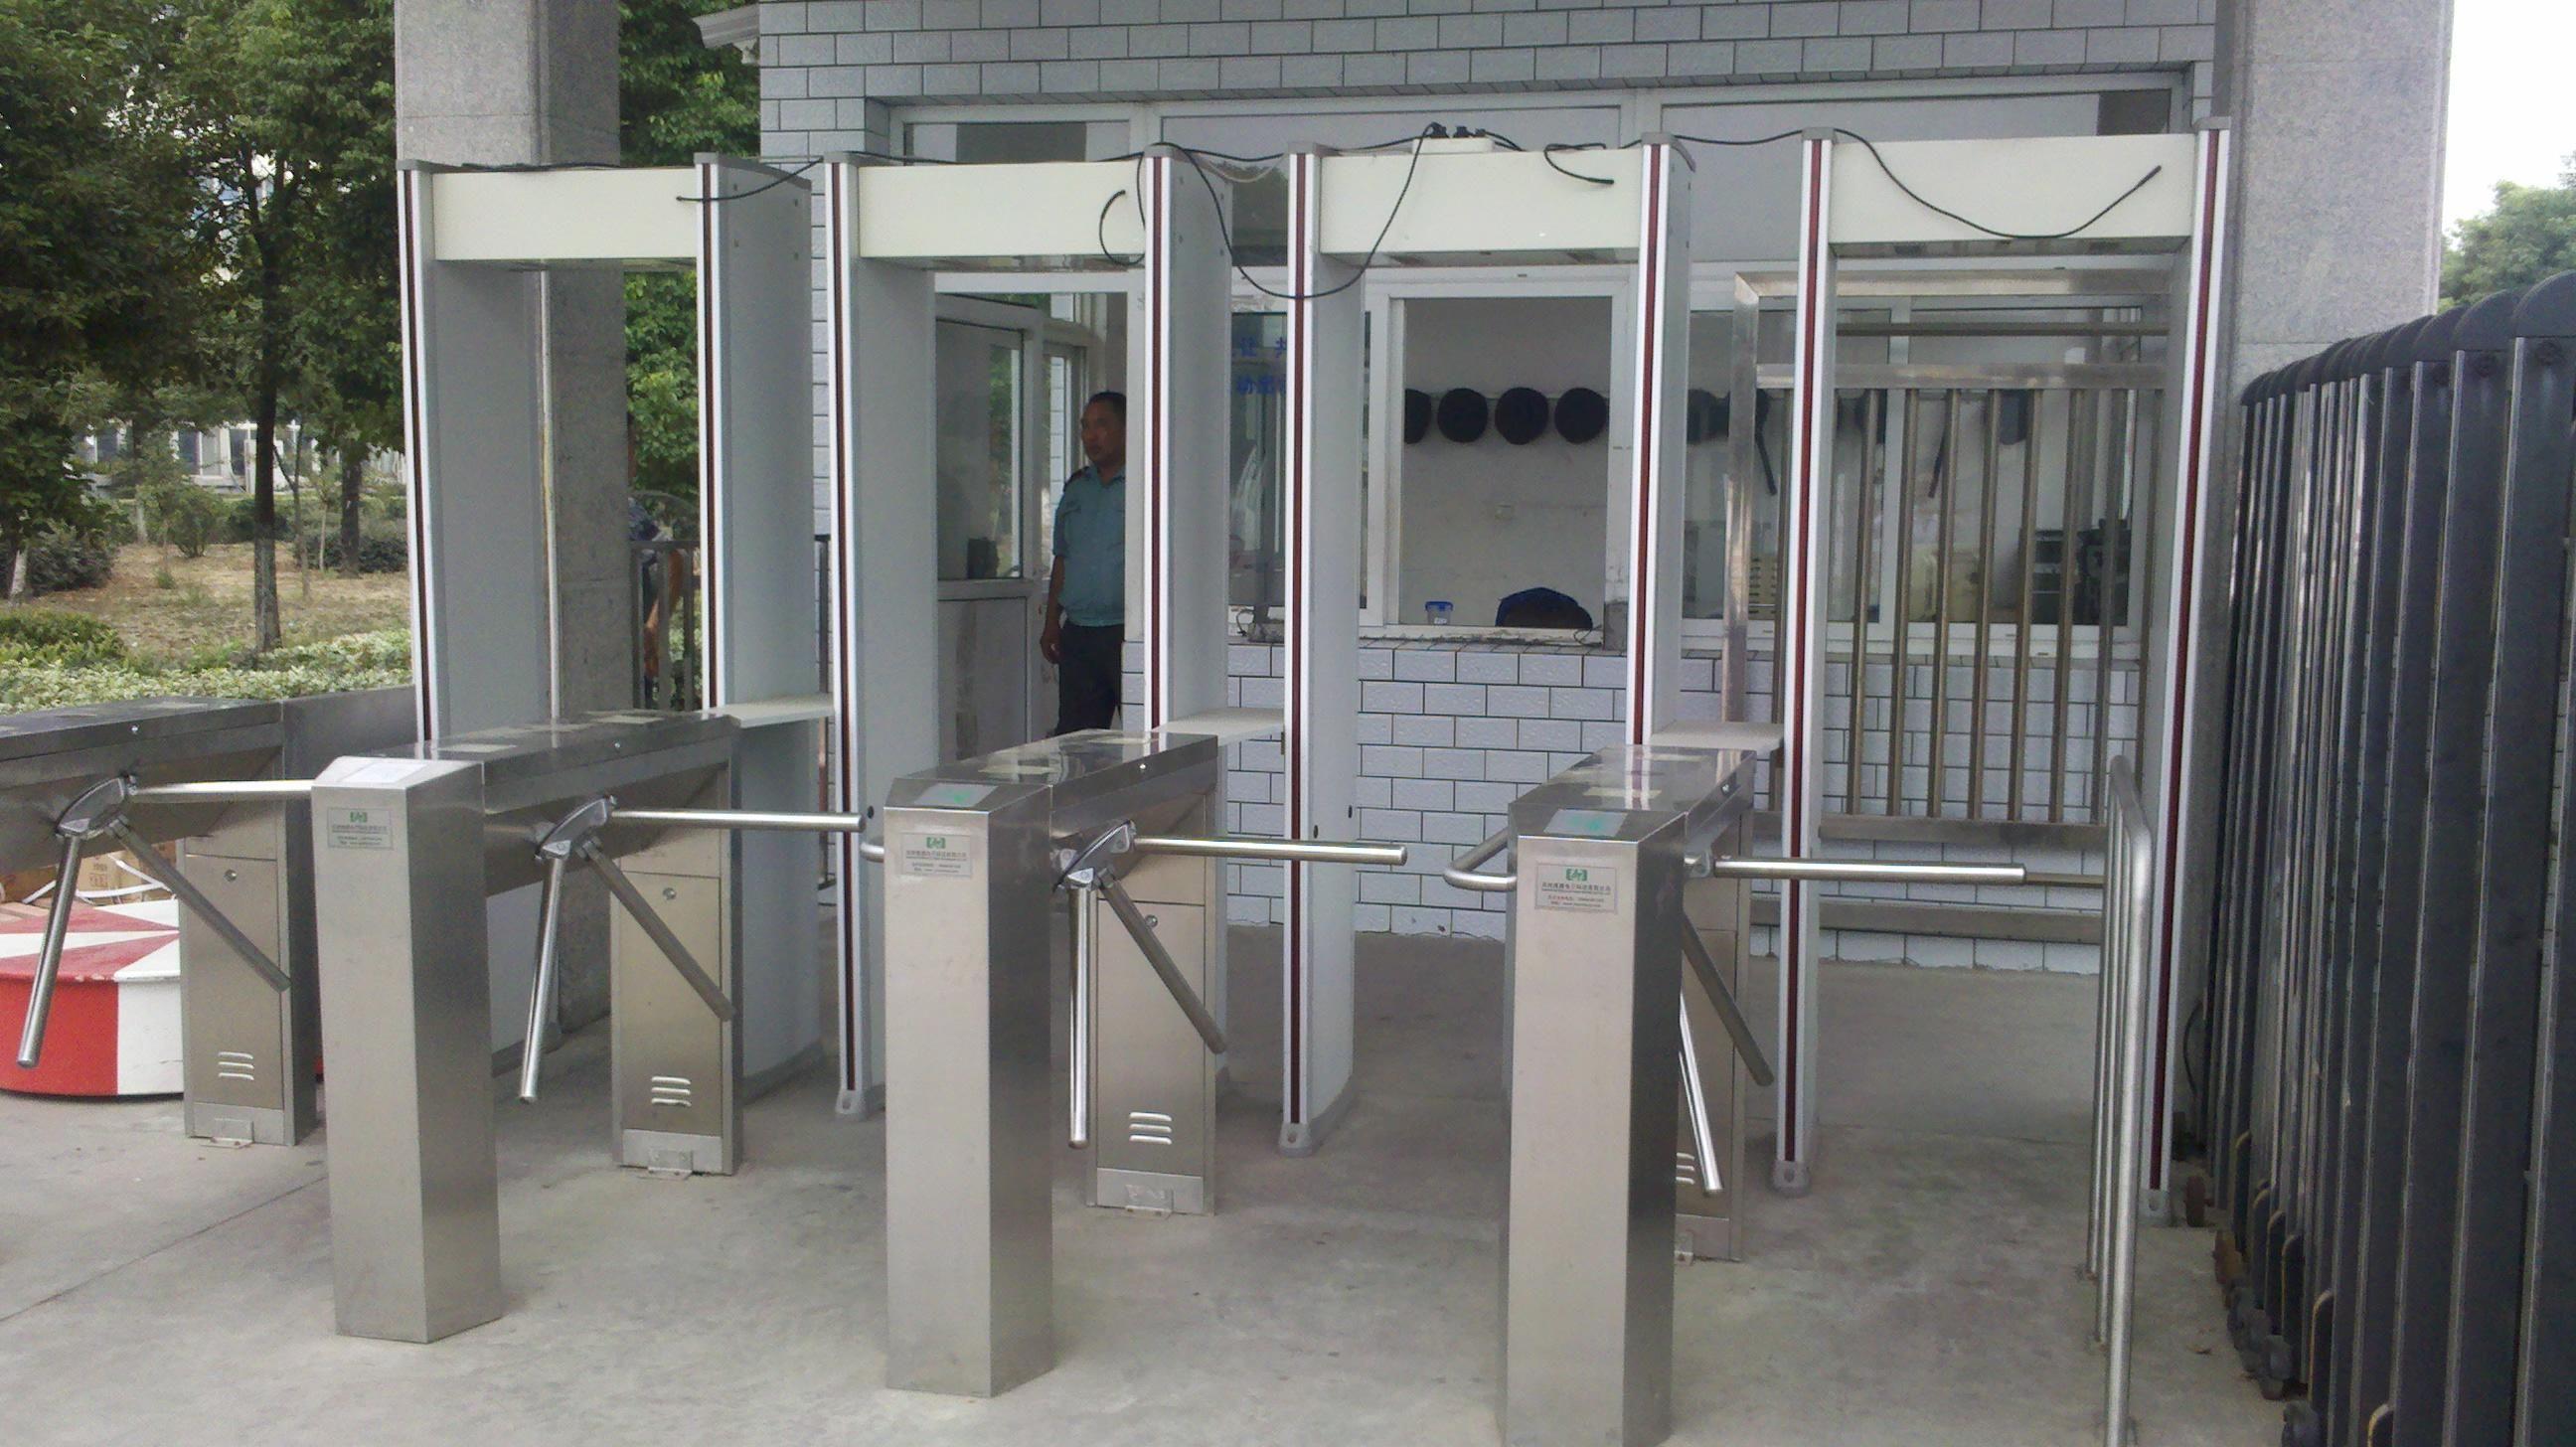 Arched Metal Detector Security Door For Government Building Walk Through Metal Detector Inspection Mirror Metal Detector